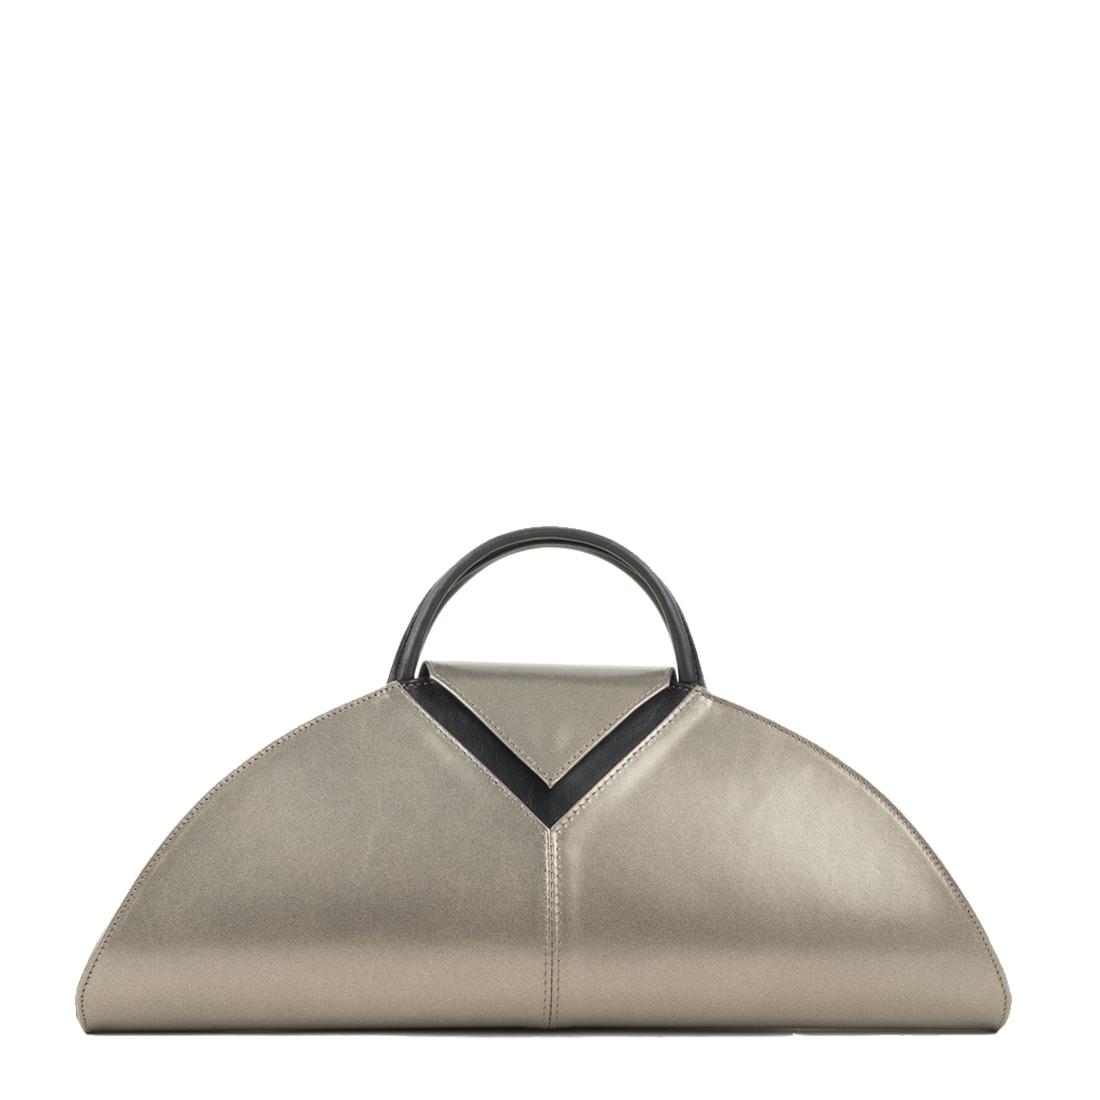 V Clutch Bronze Leather Handbag